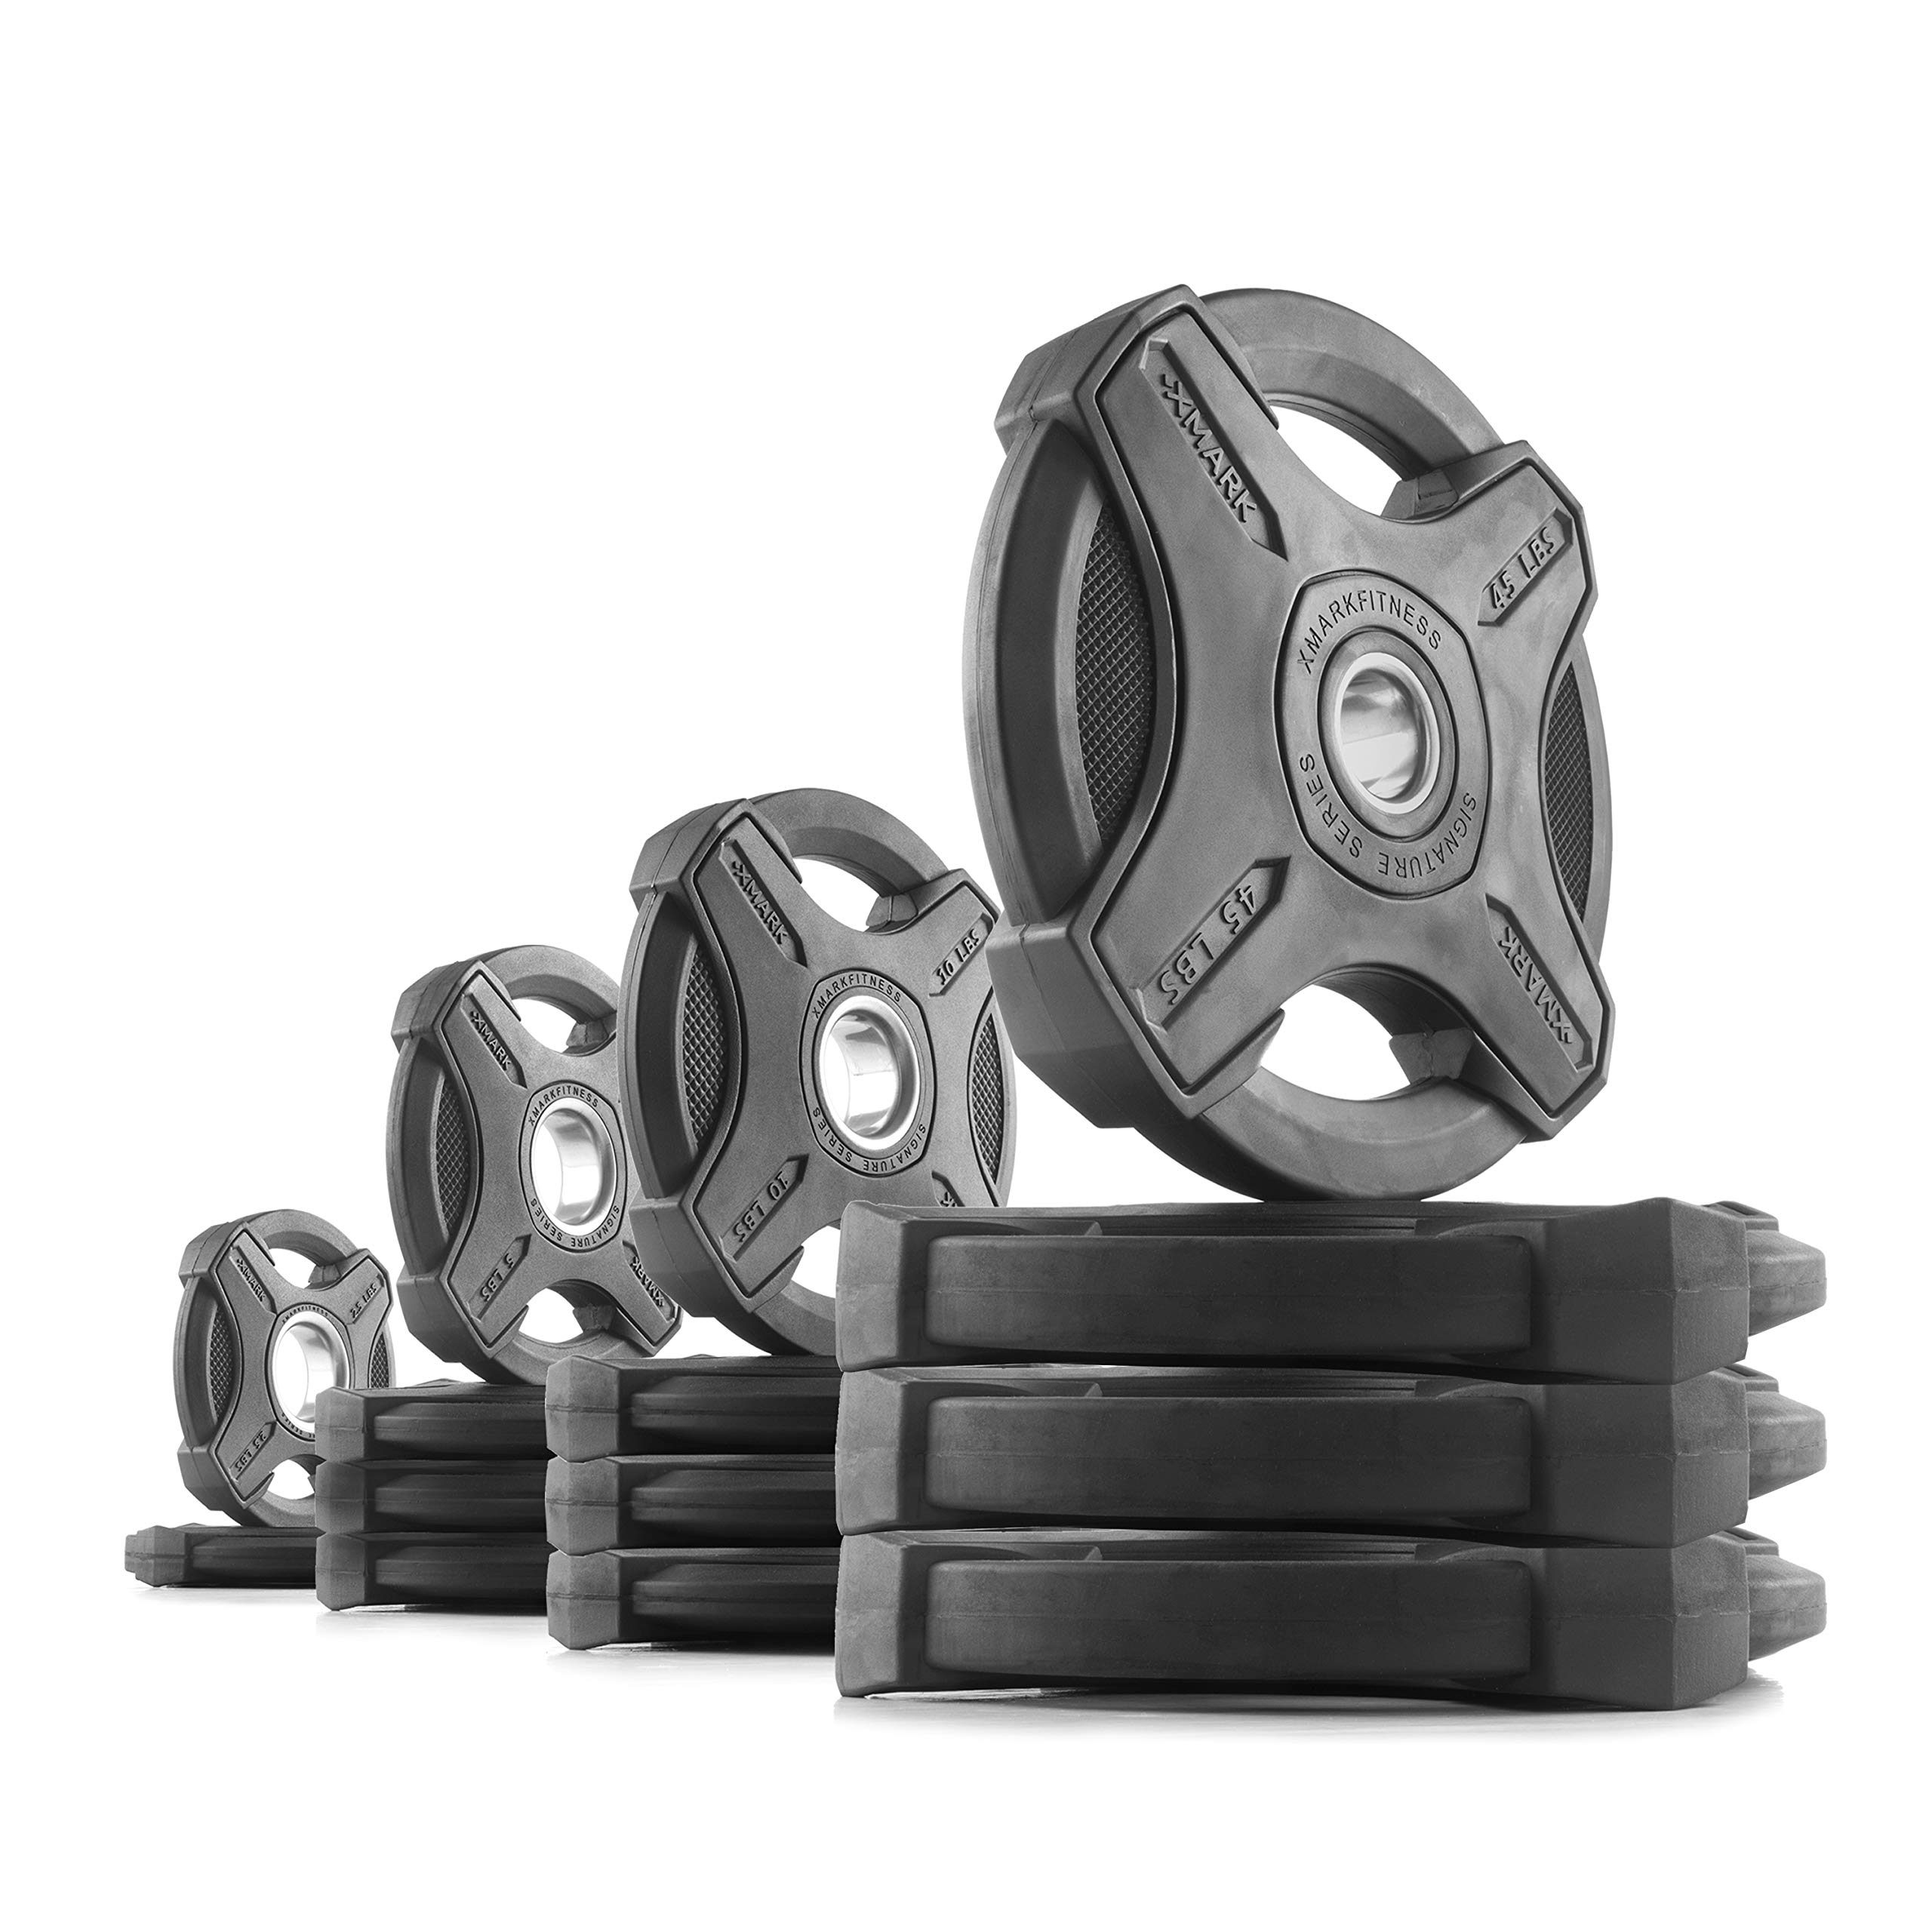 XMark 245 lb Set Signature Plates, One-Year Warranty, Olympic Weight Plates, Cutting-Edge Design